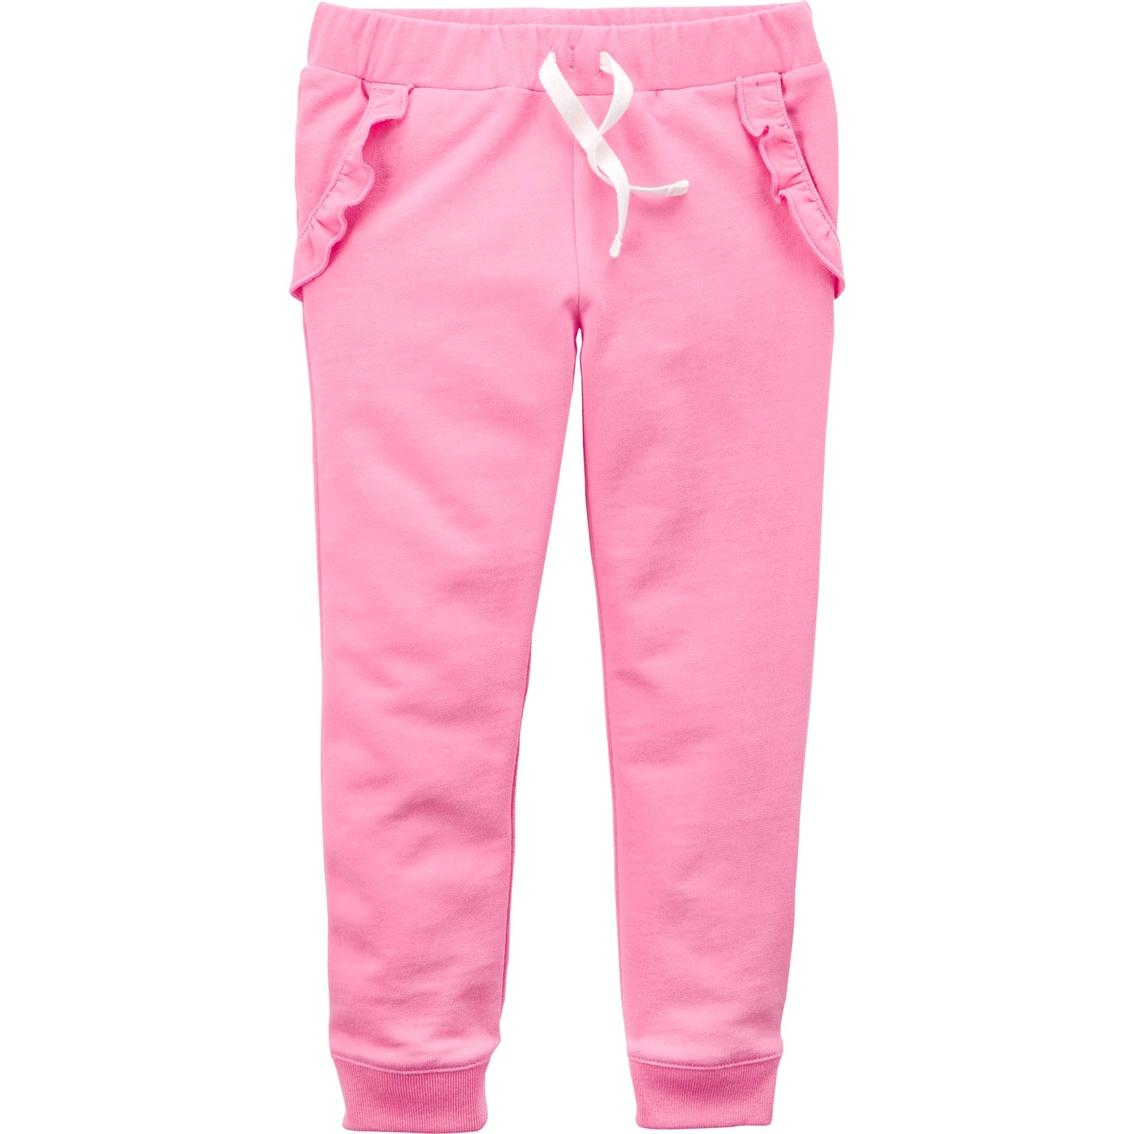 da3f50938 Carter's Toddler Girls Ruffle Pocket Jogger Pants | Toddler Girls 2t ...